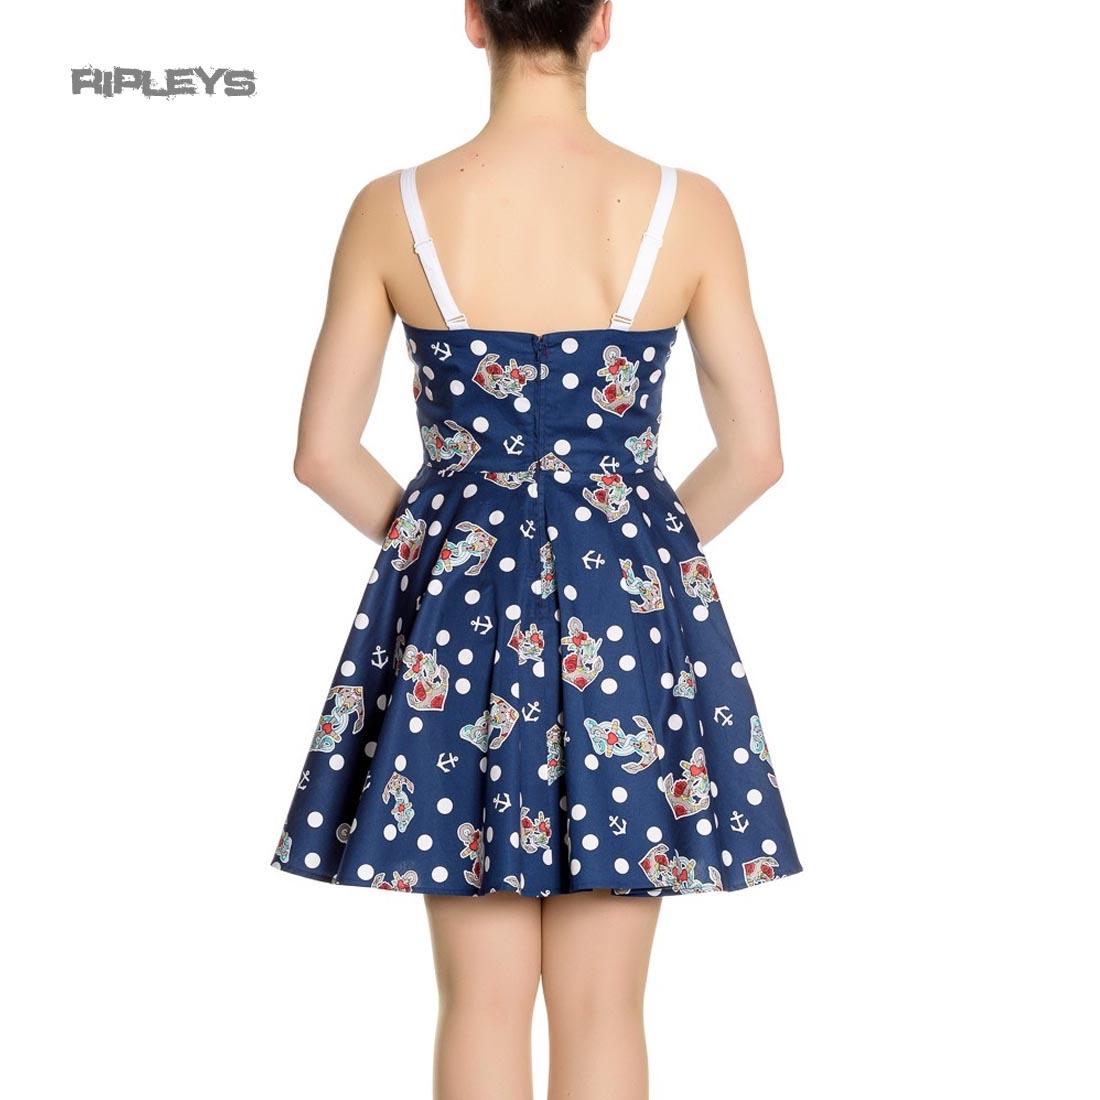 Hell-Bunny-Navy-Blue-50s-Nautical-Mini-Dress-OCEANA-Polka-Dot-All-Sizes thumbnail 32